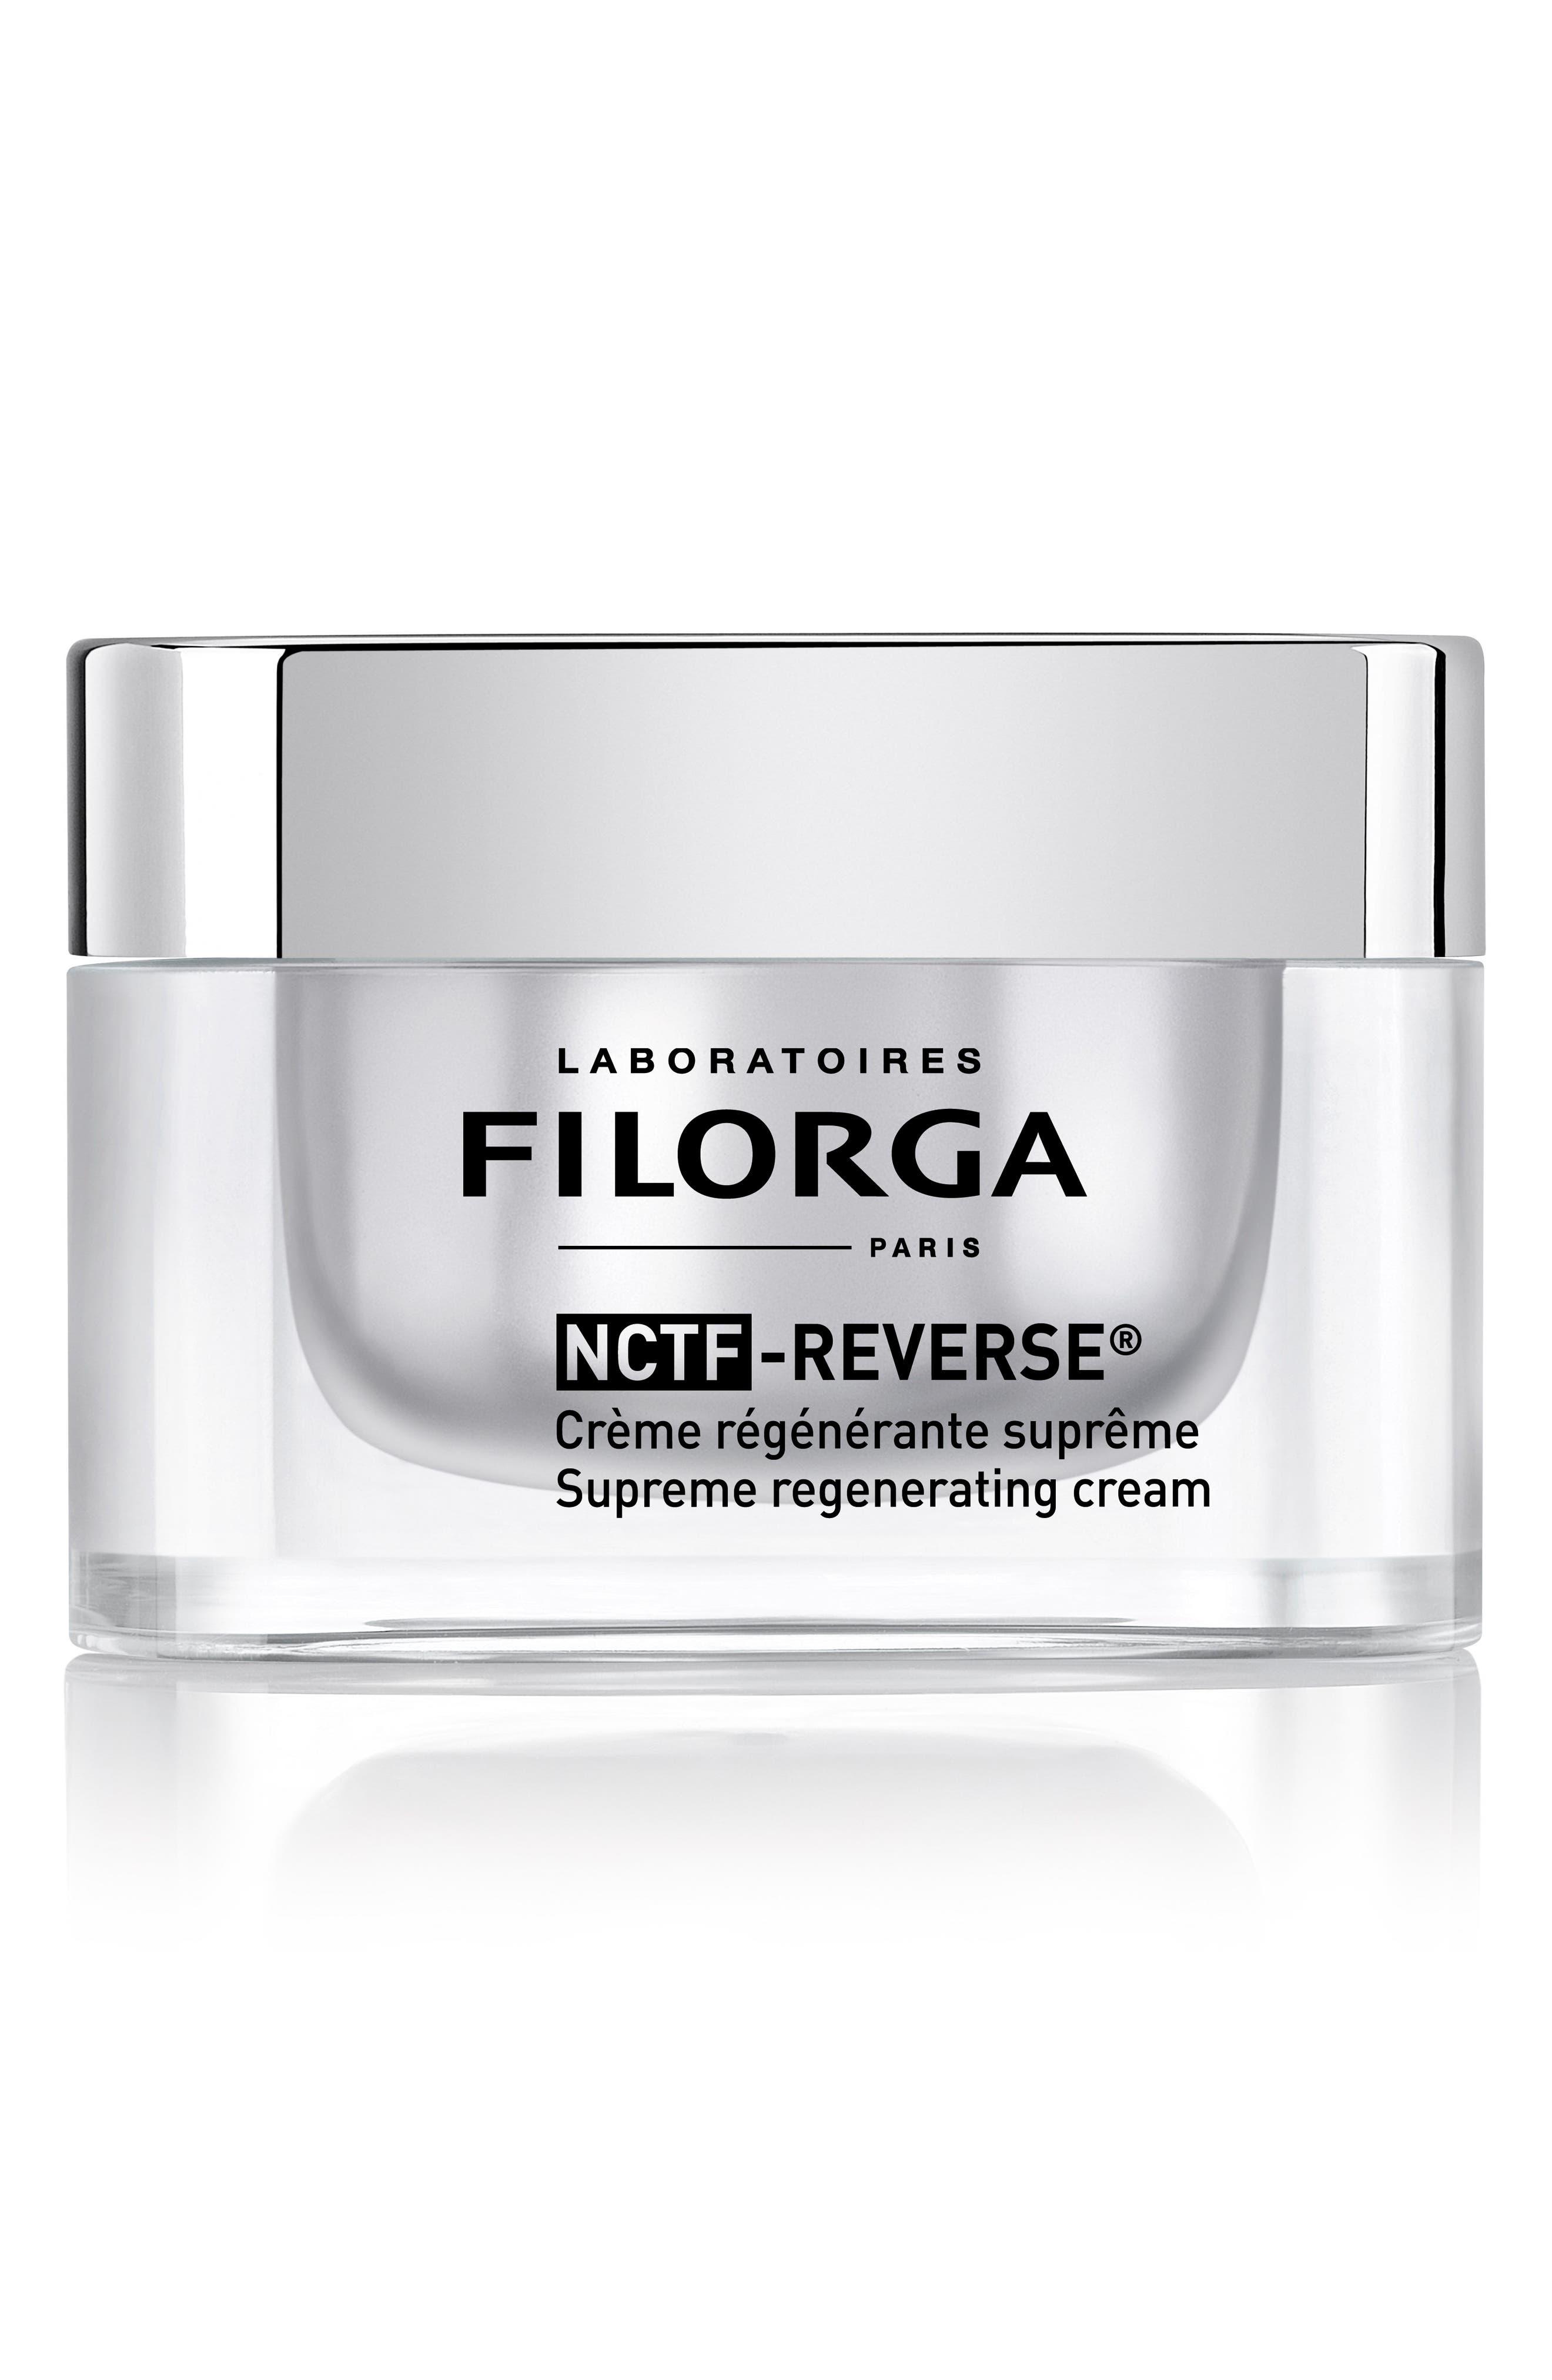 NCTF-Reverse<sup>®</sup> Supreme Regenerating Cream,                             Main thumbnail 1, color,                             NO COLOR